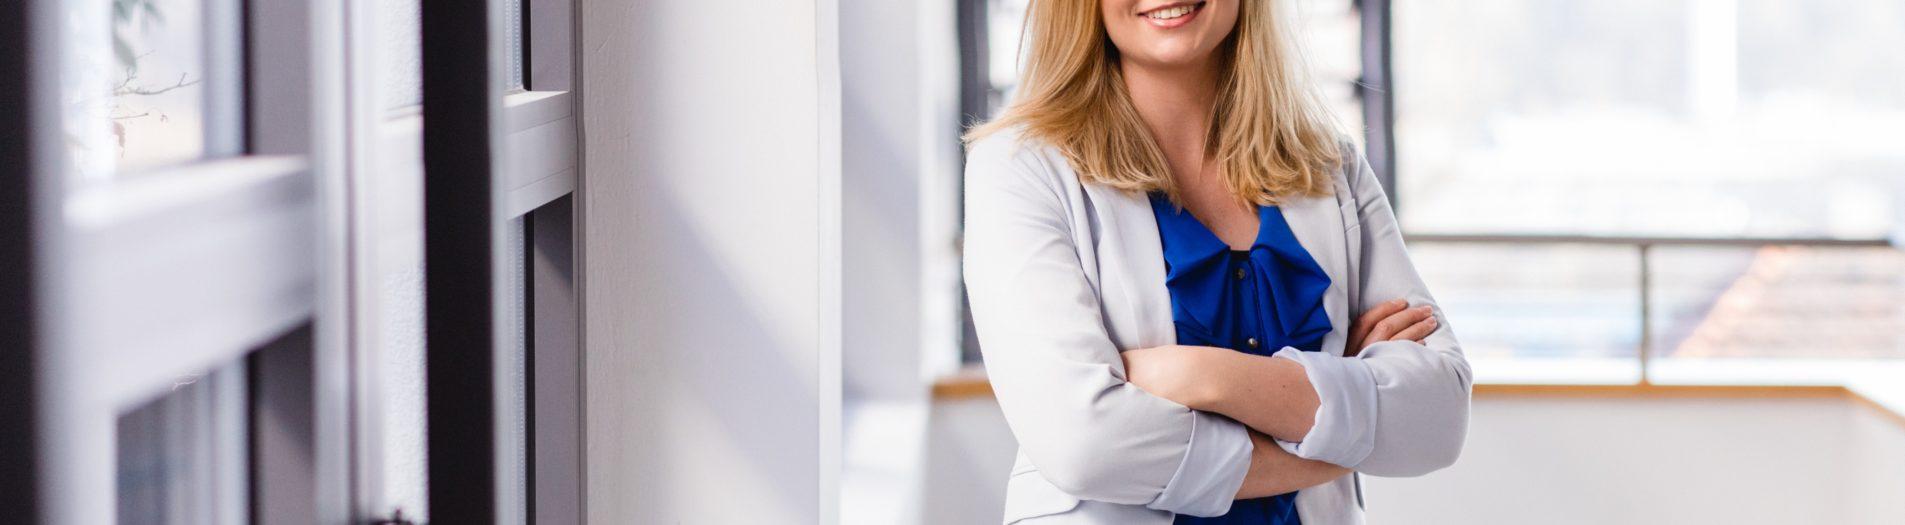 Professionelle Businessfotos und Bewerbungsfotos